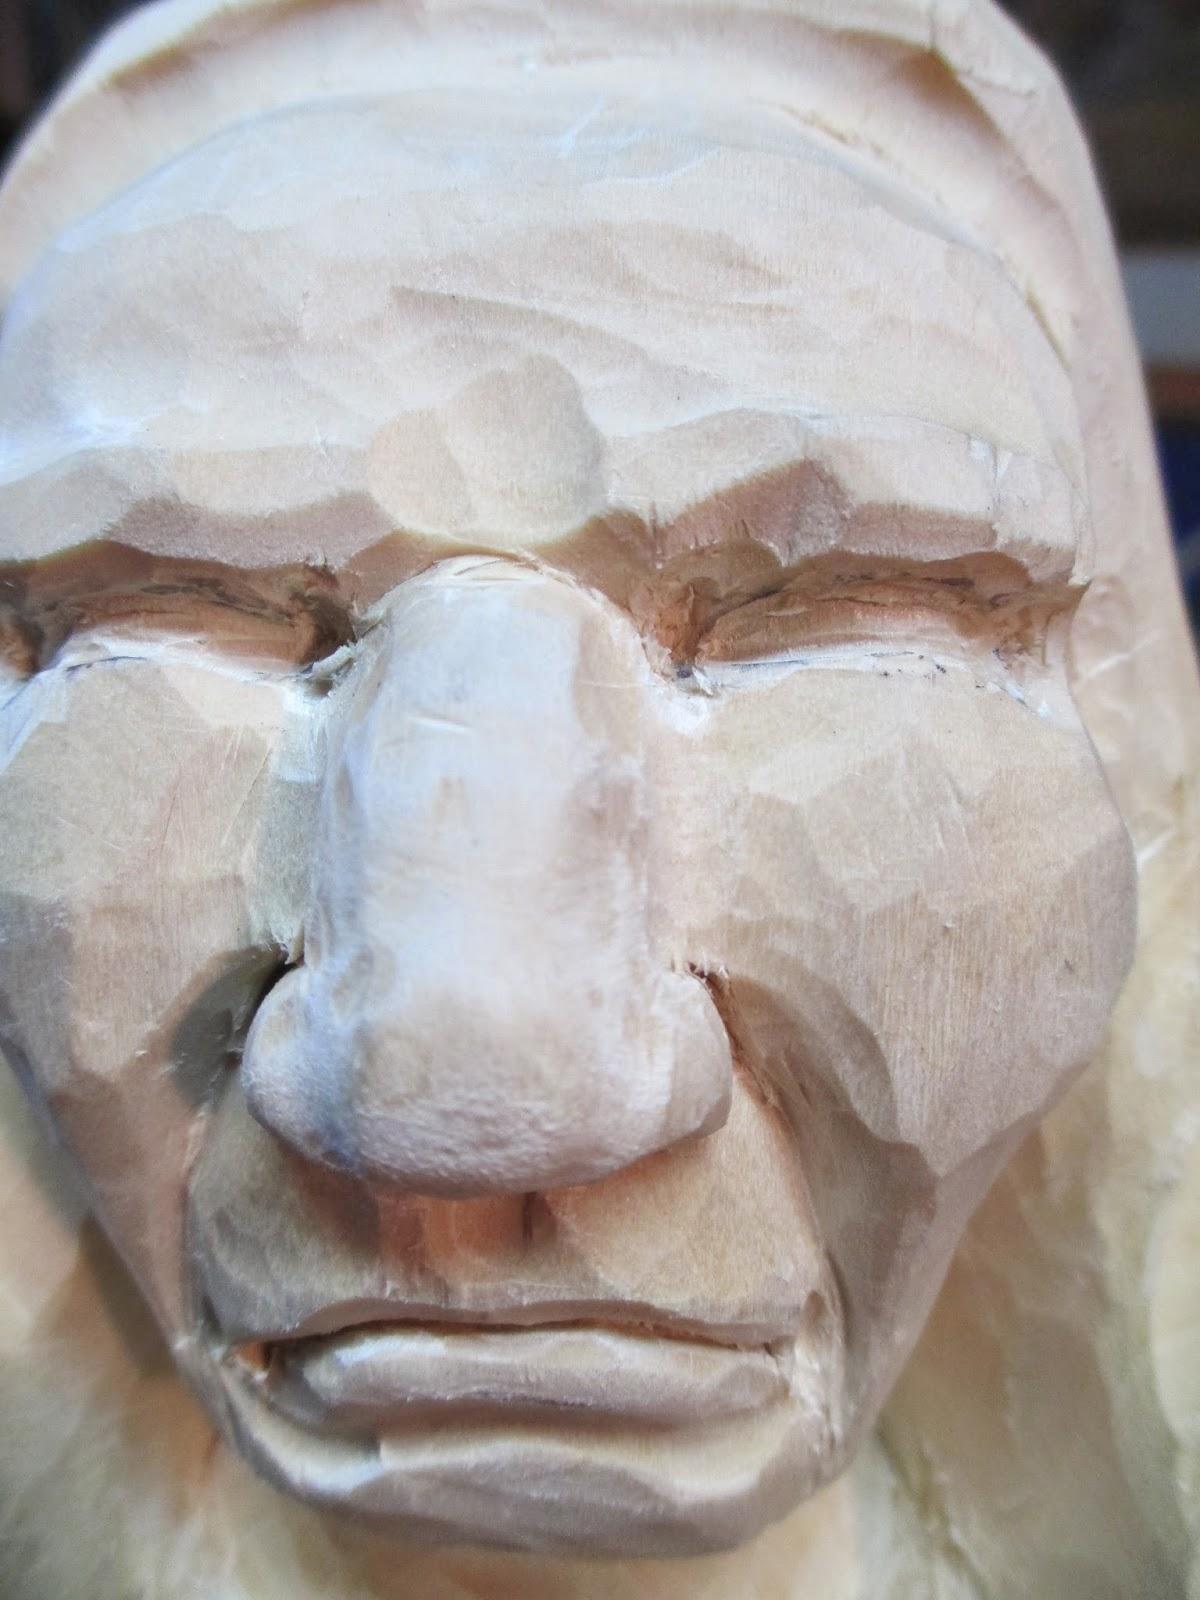 Knotty wood spirits carving an eye